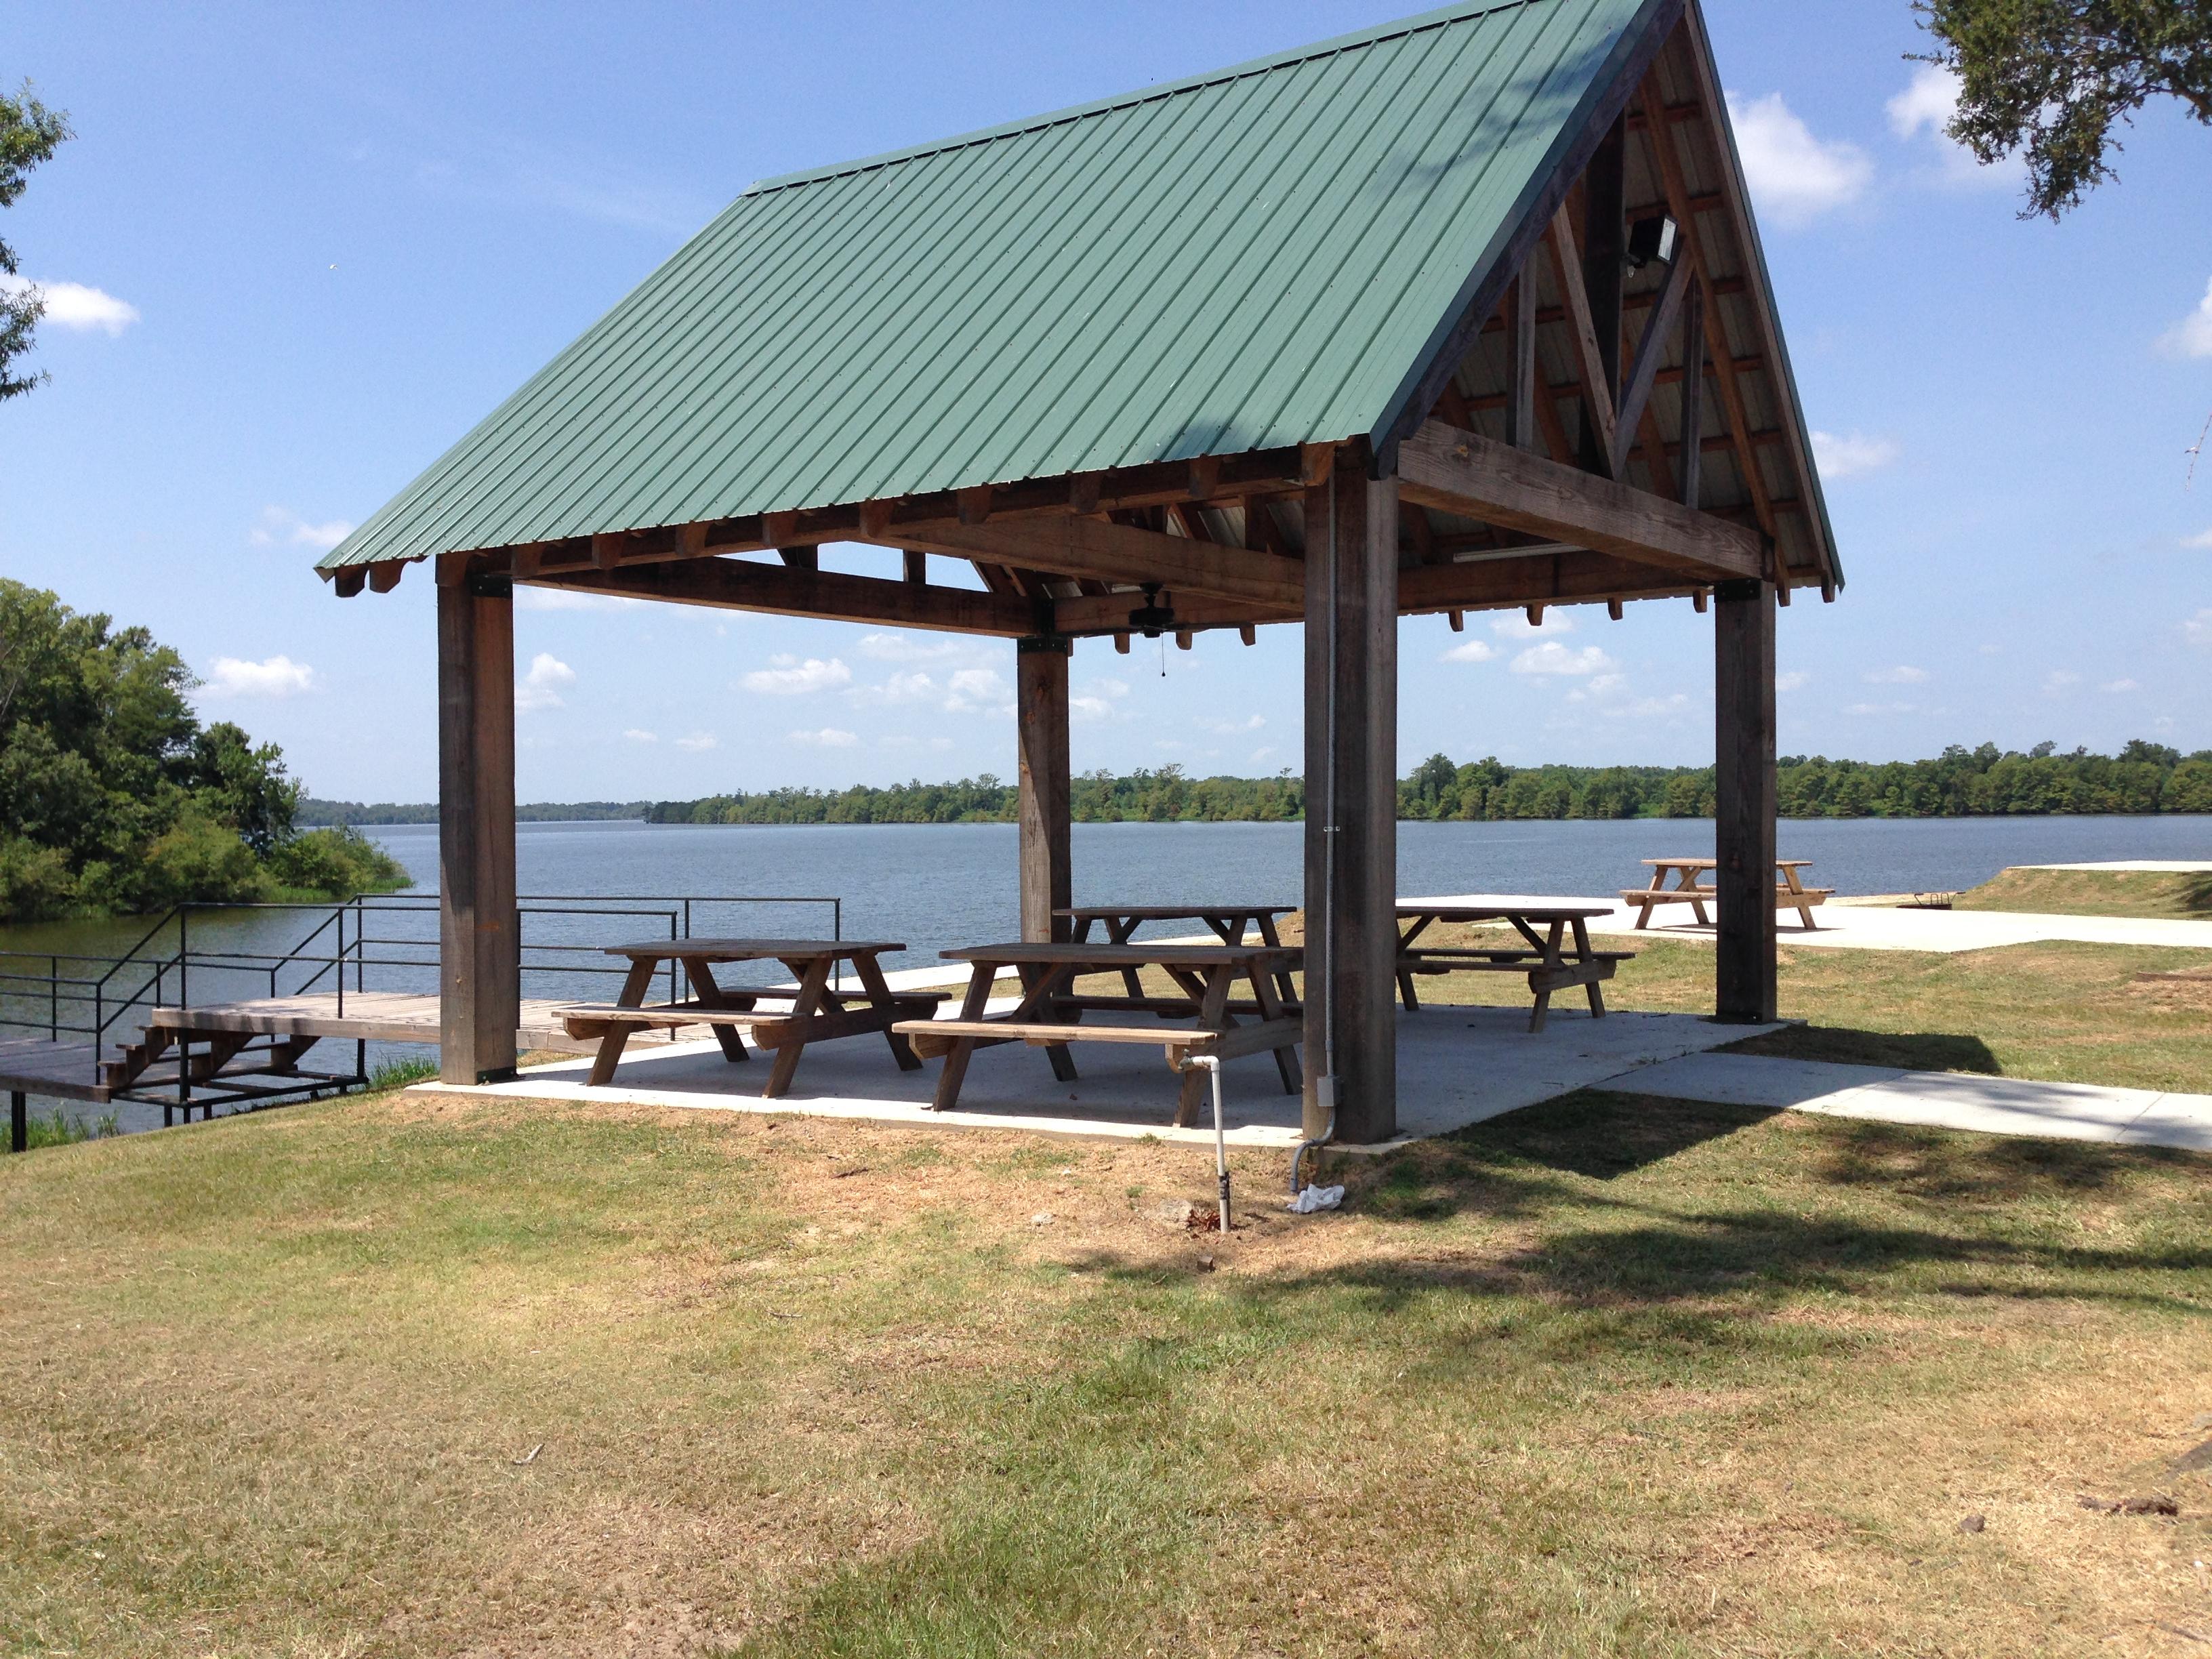 Lakeview Paradise RV Resort